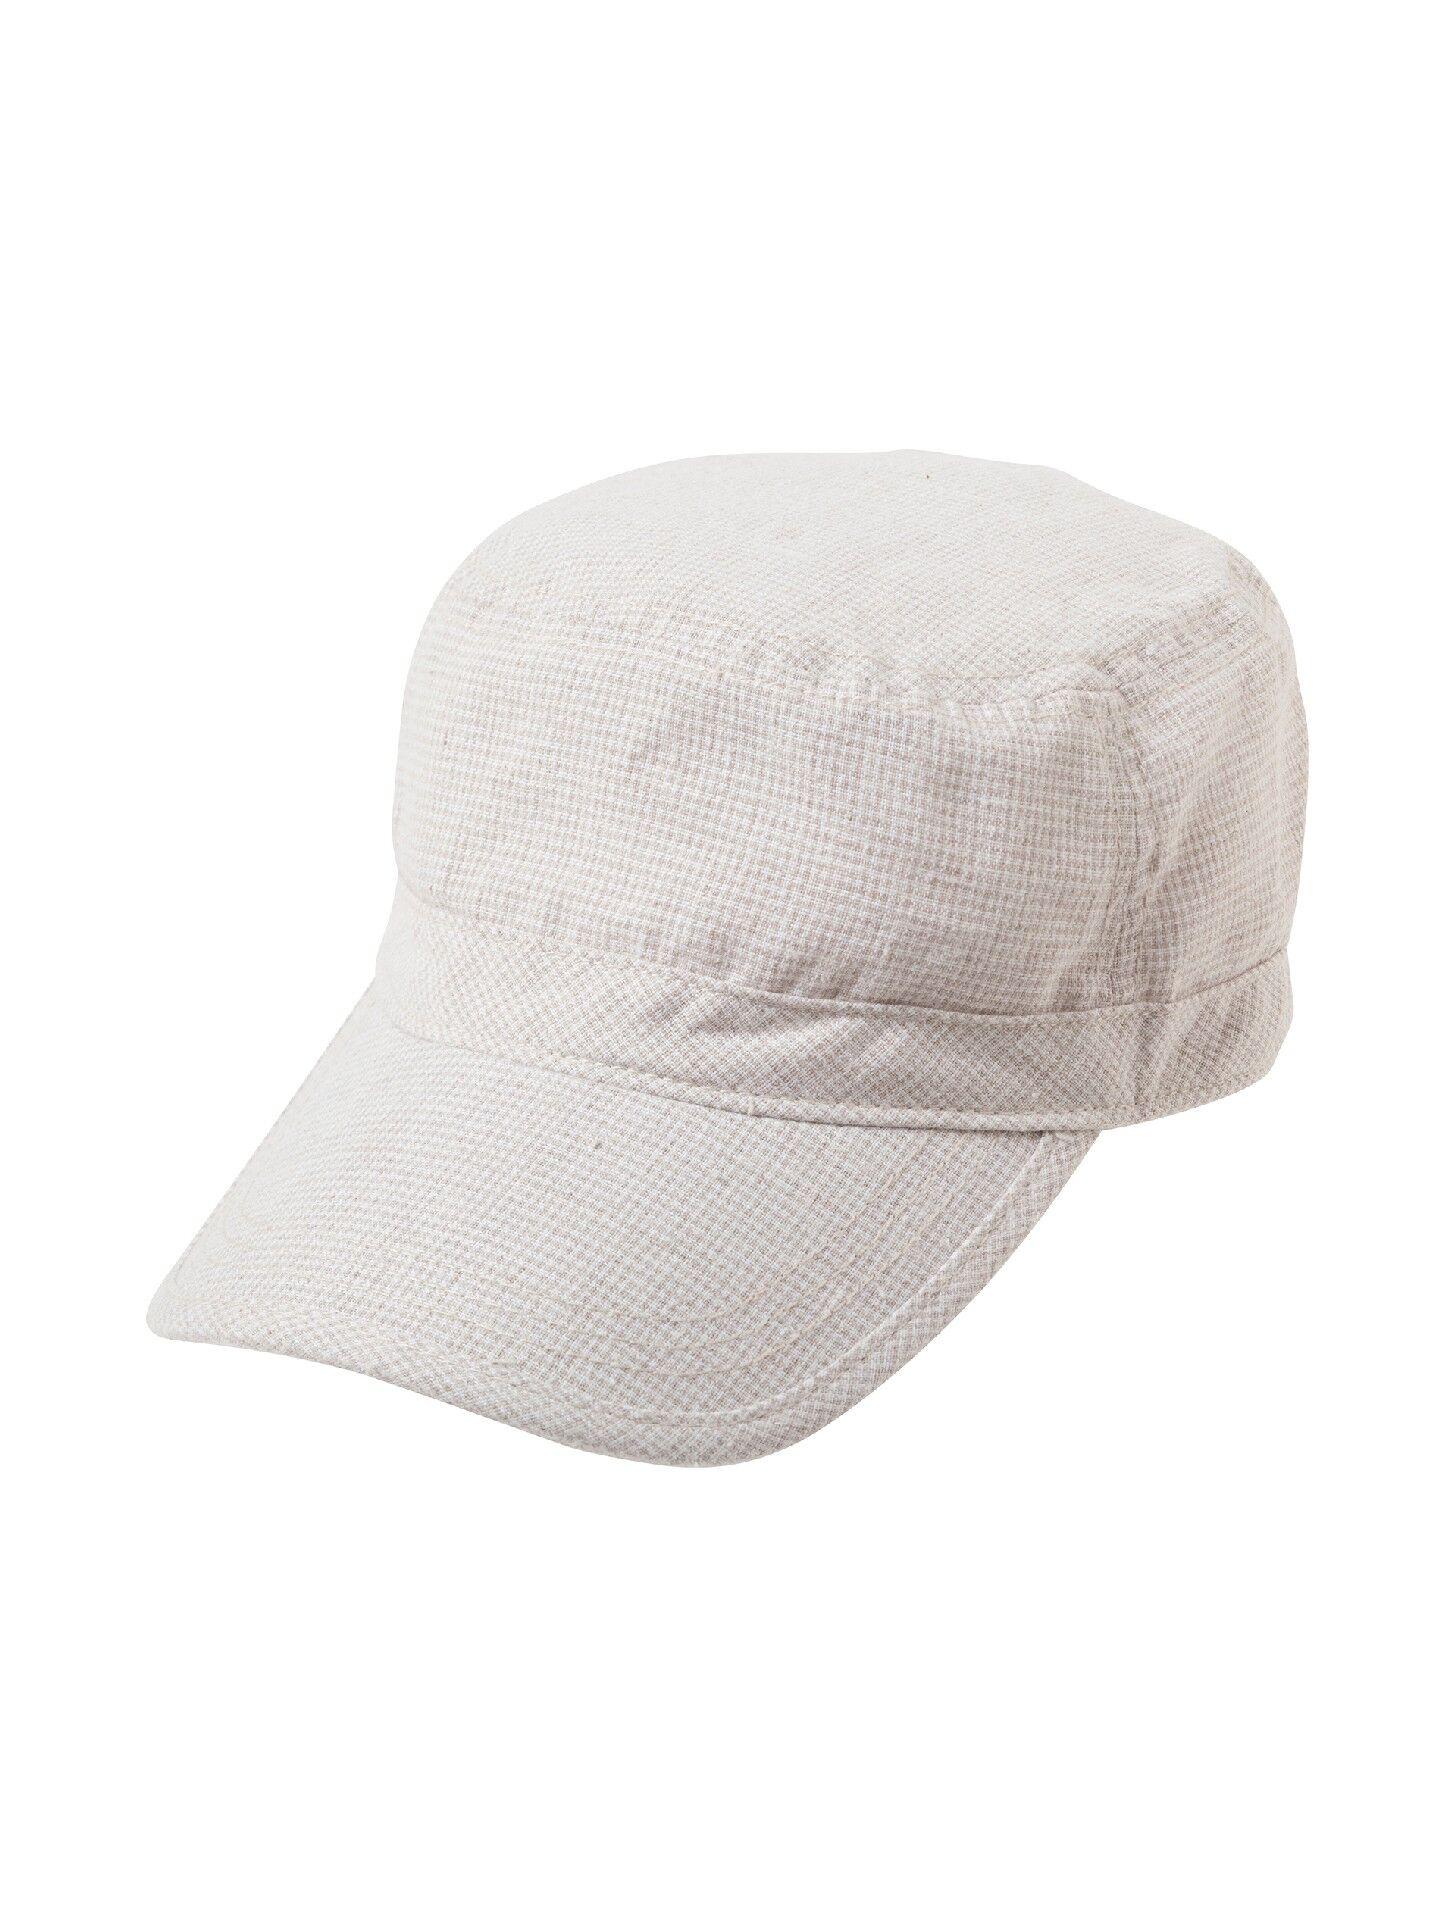 Alternative Apparel Fidel Cap - Tiny Houndstooth - Size: OS